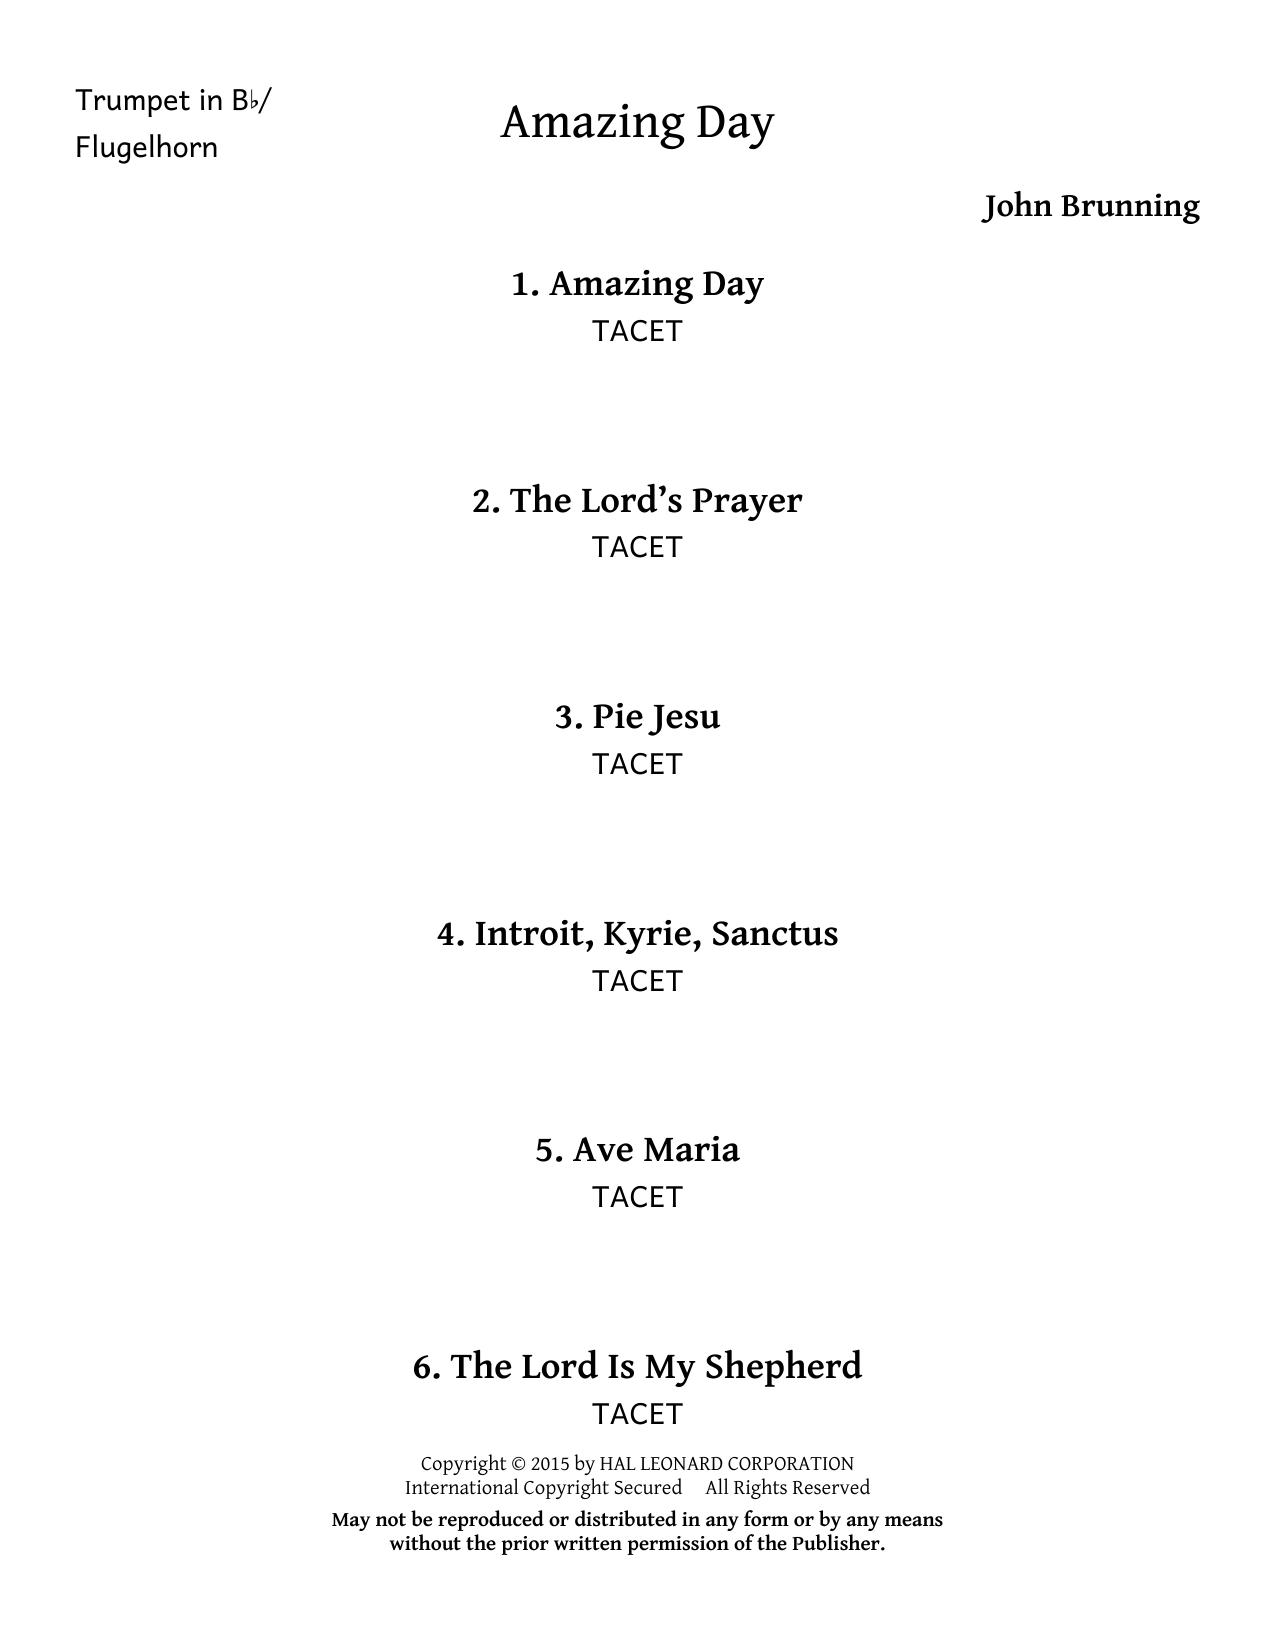 John Brunning Amazing Day - Trumpet/Flugelhorn sheet music notes and chords. Download Printable PDF.